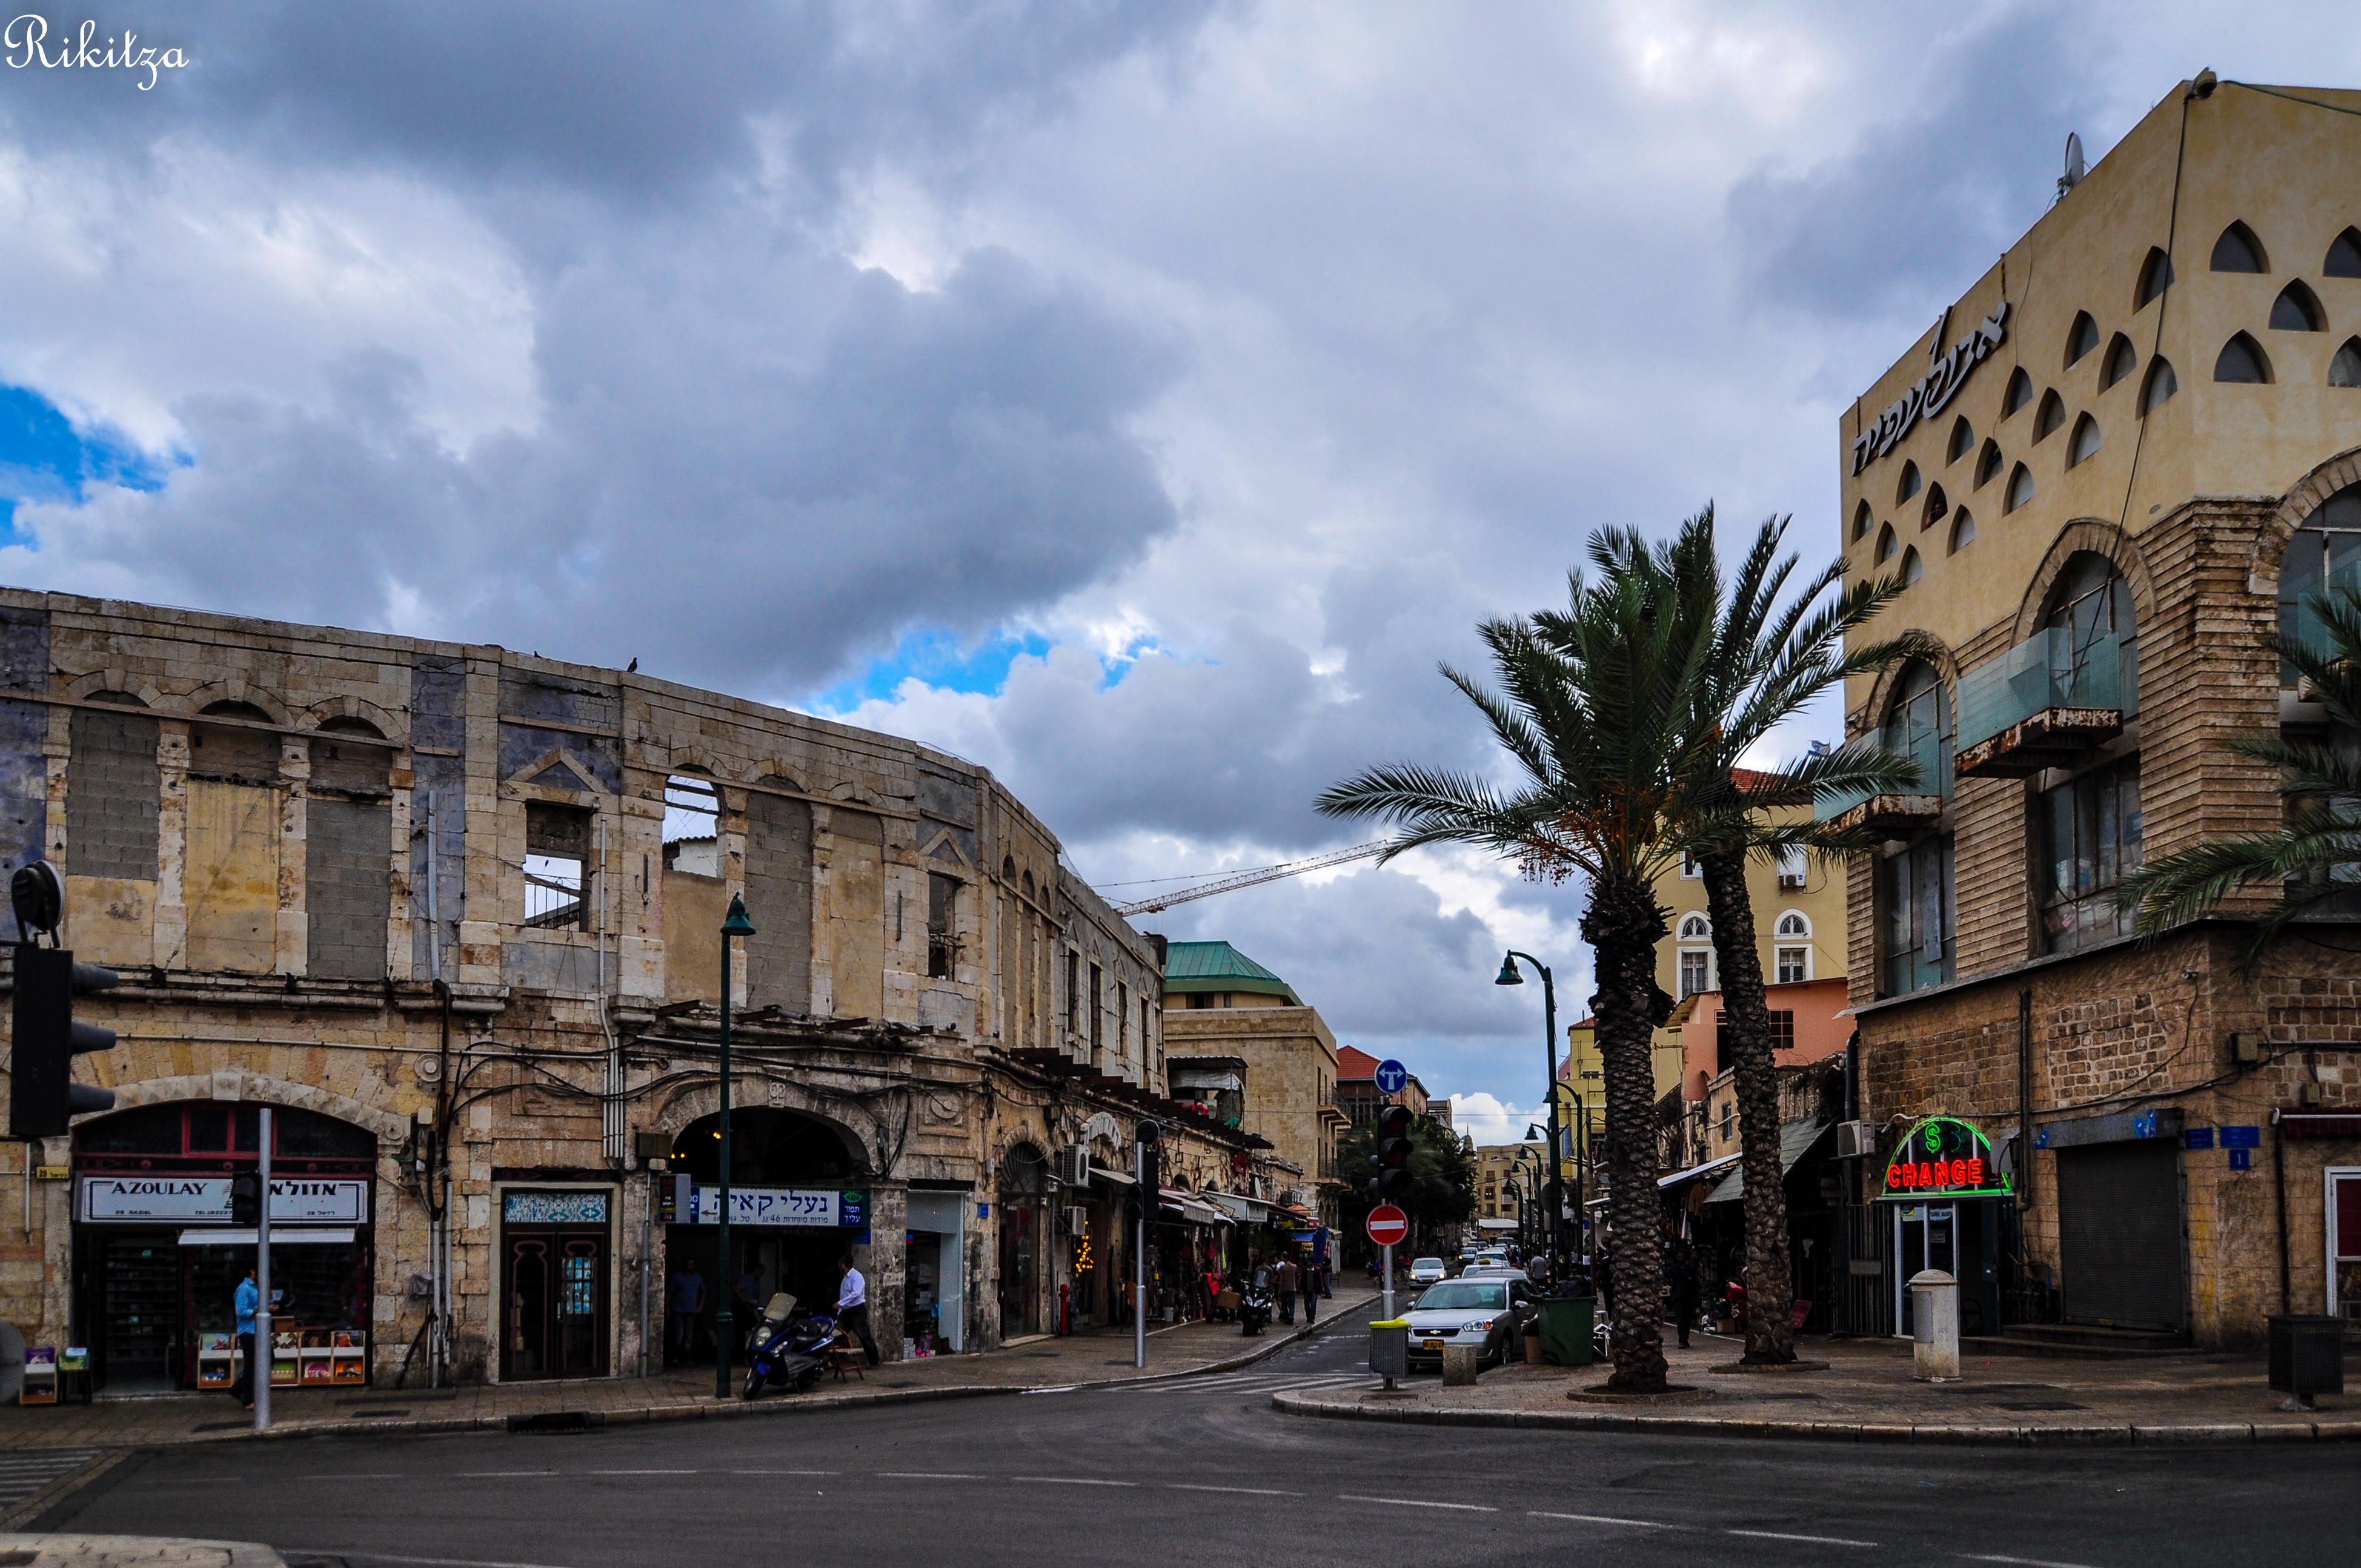 Jaffa sky by Rikitza